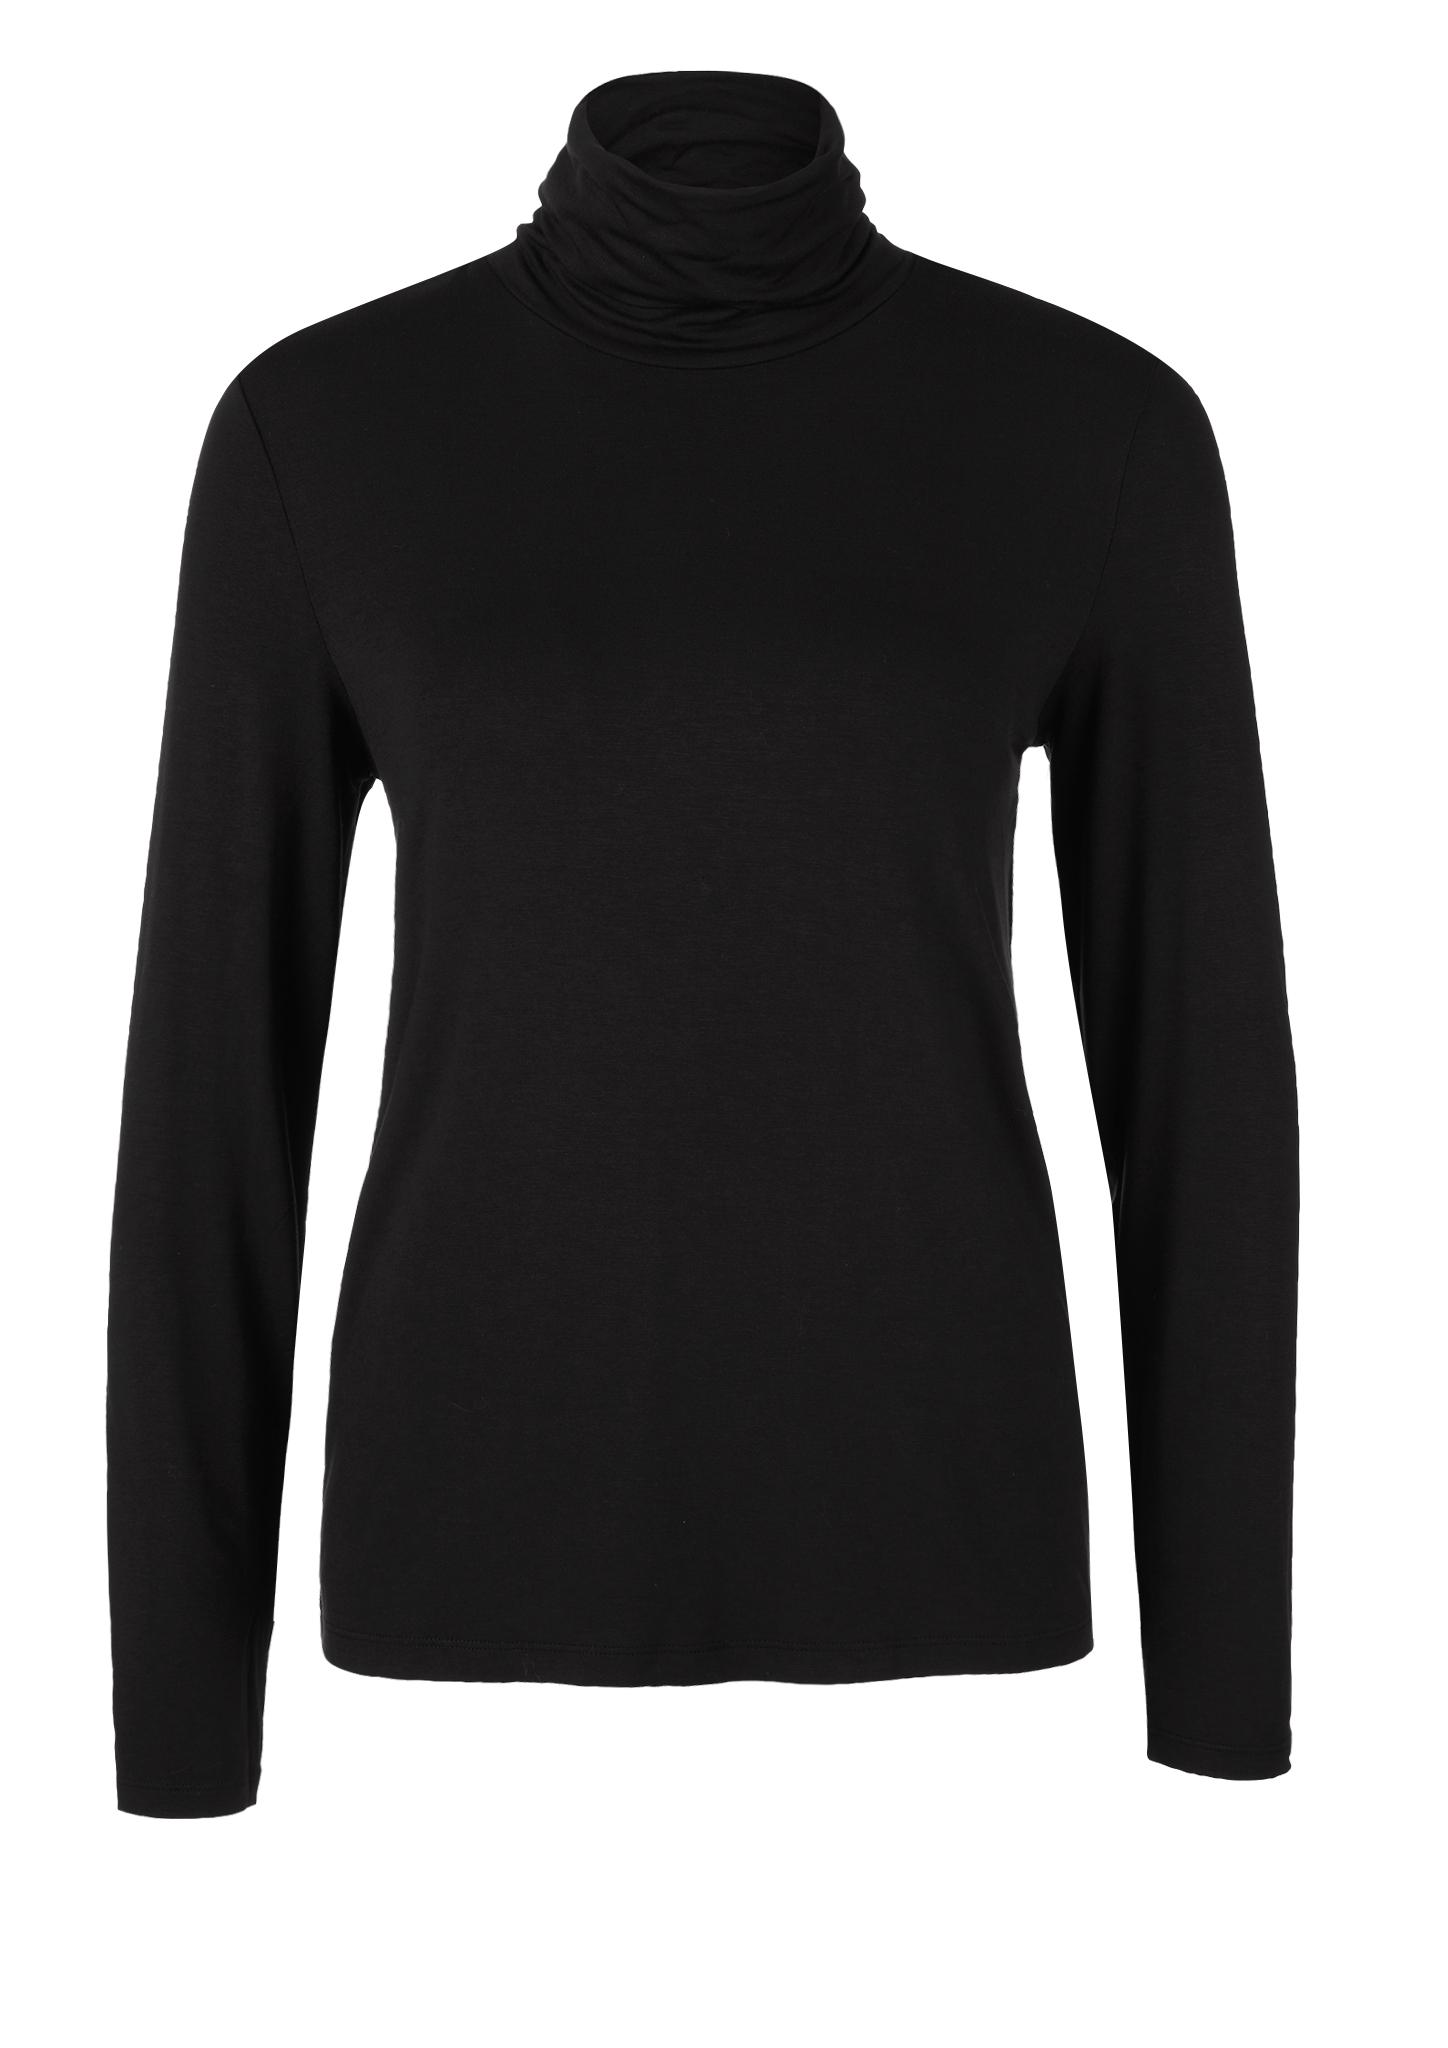 Rollkragenshirt | Bekleidung > Shirts > Rollkragenshirts | Schwarz | 95% viskose -  5% elasthan | s.Oliver